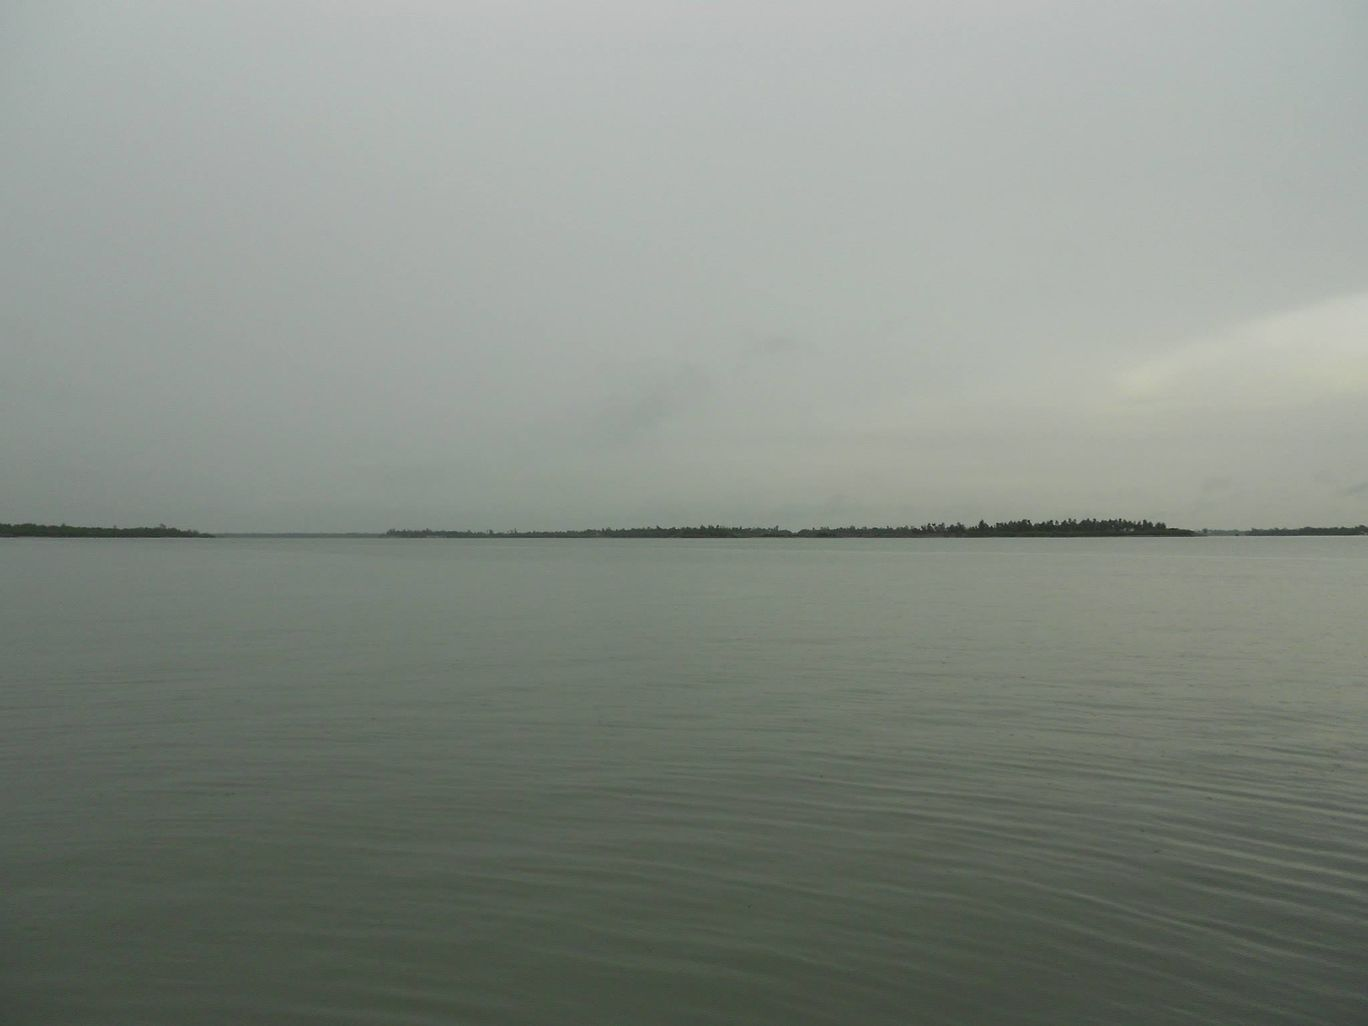 Photo of Sundarban trip. By Ratul Sengupta